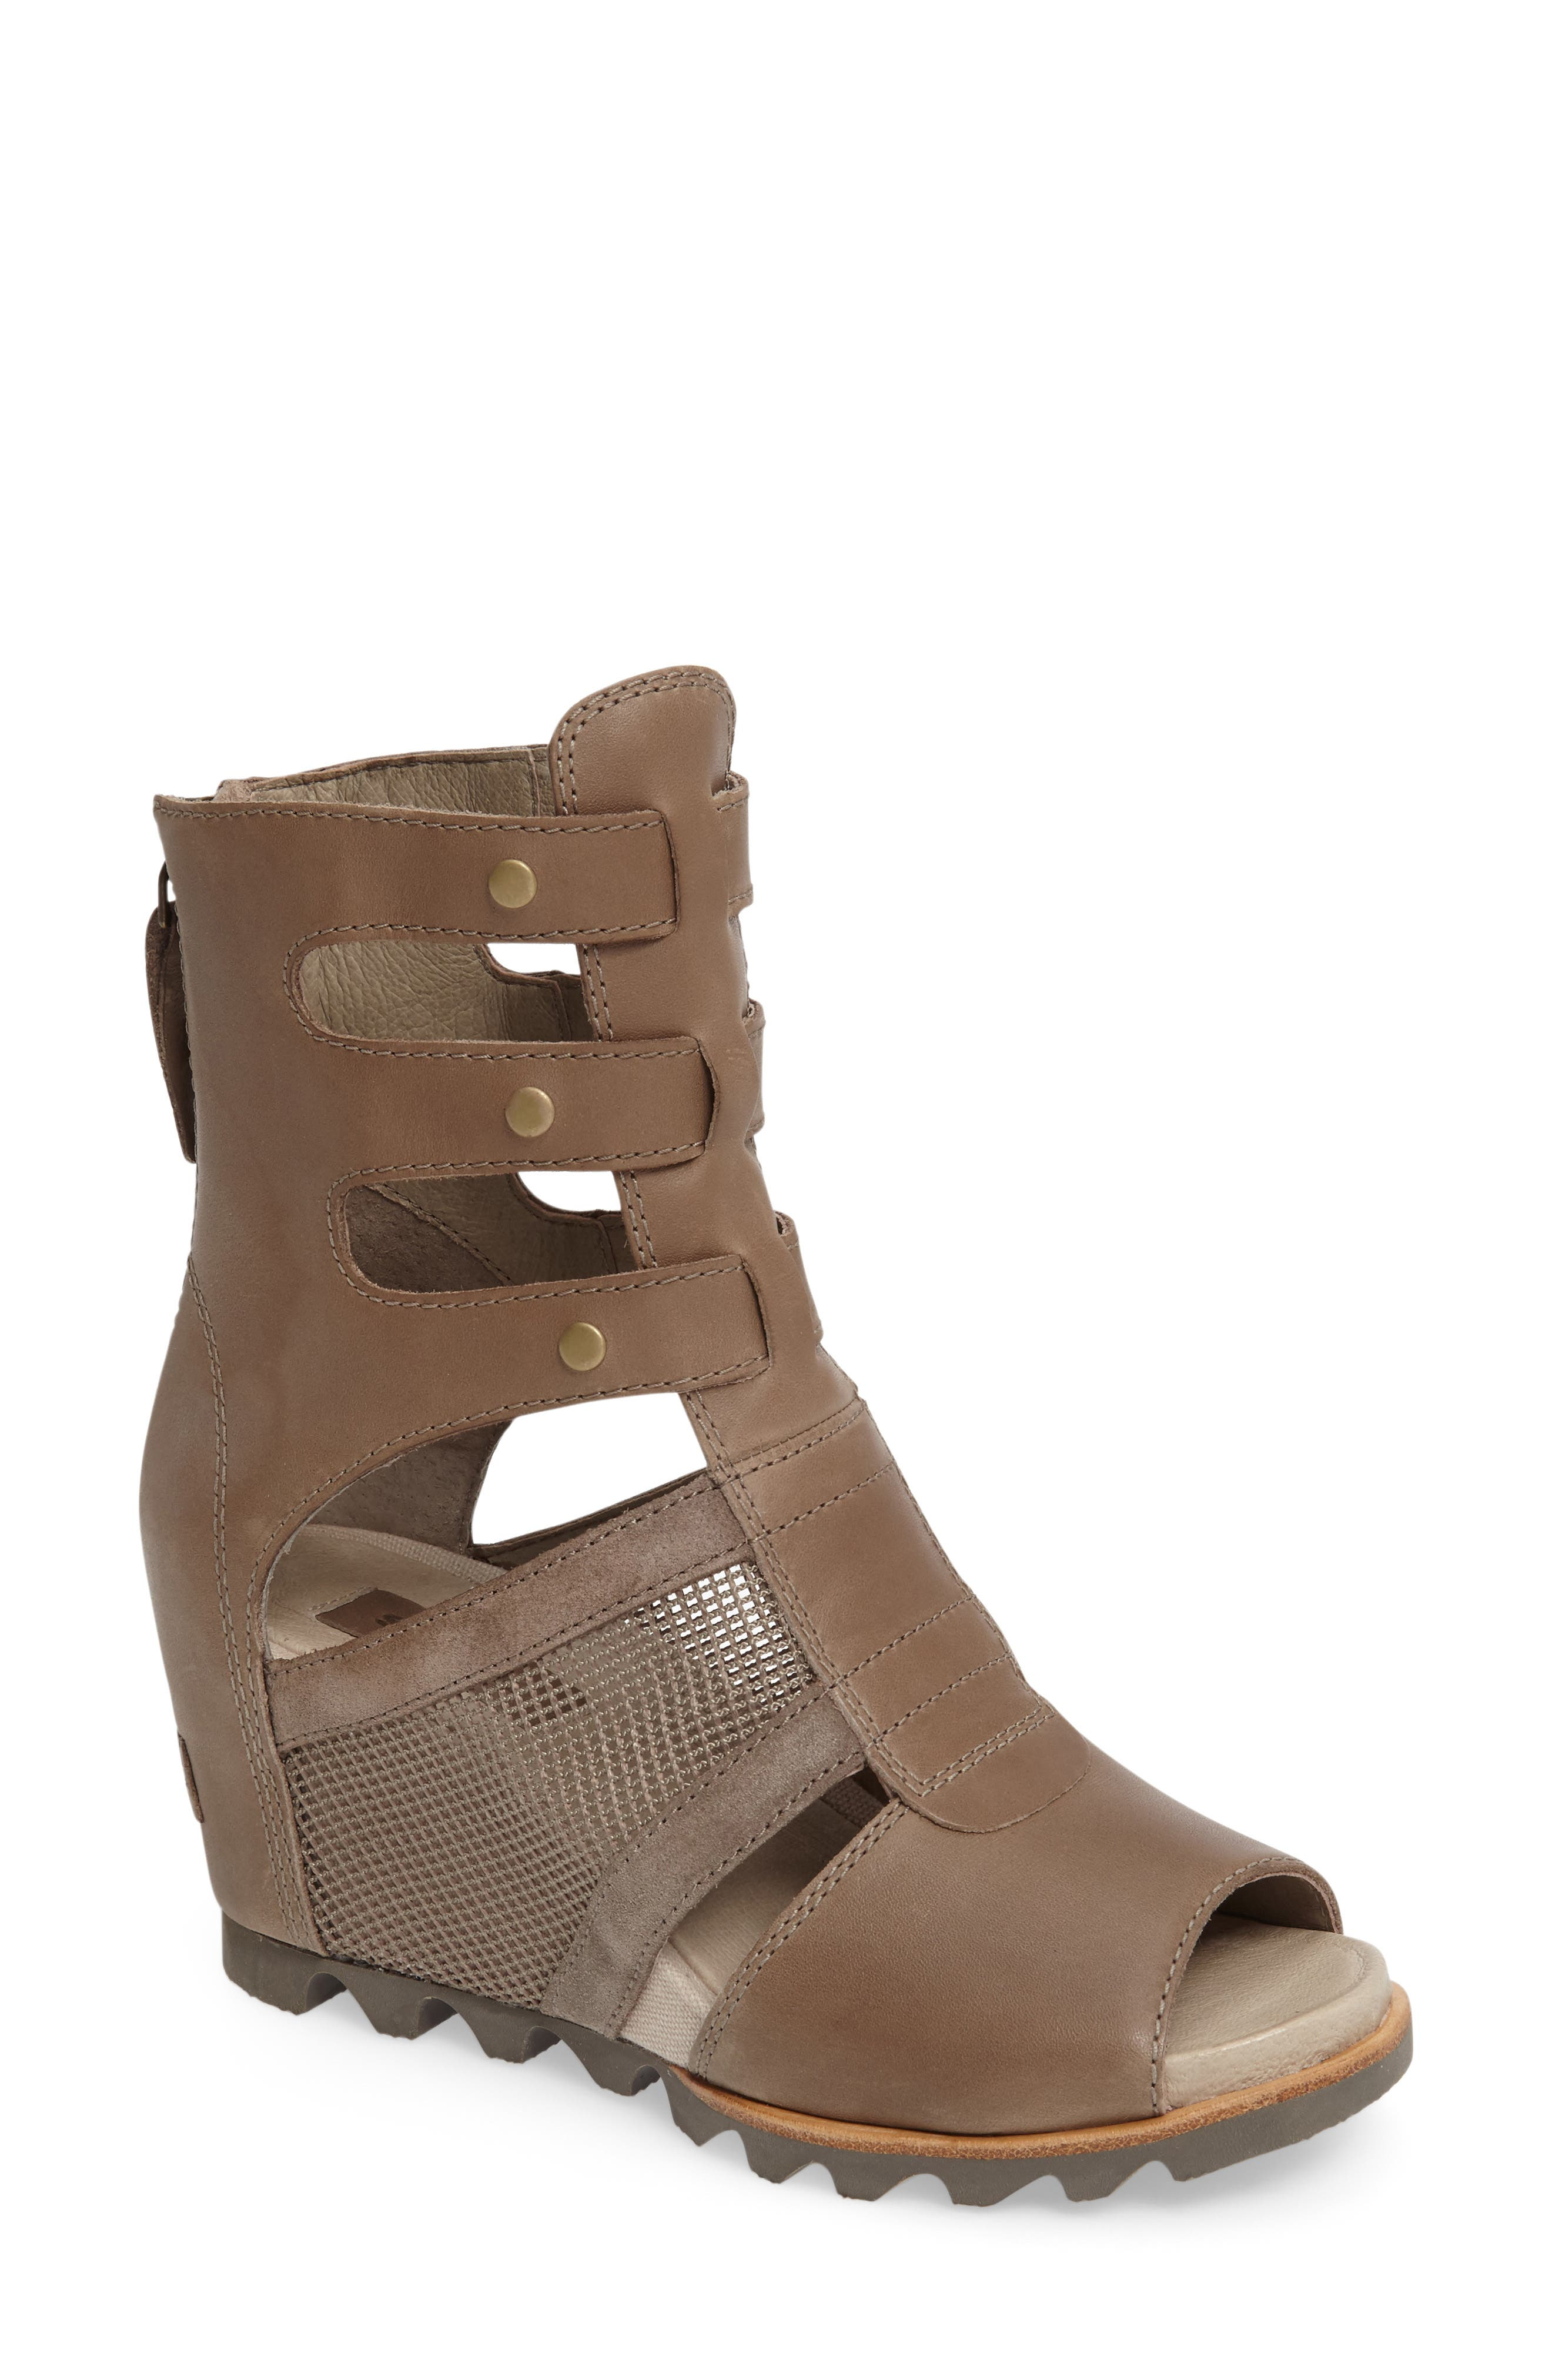 Main Image - SOREL Joanie Gladiator Sandal (Women)